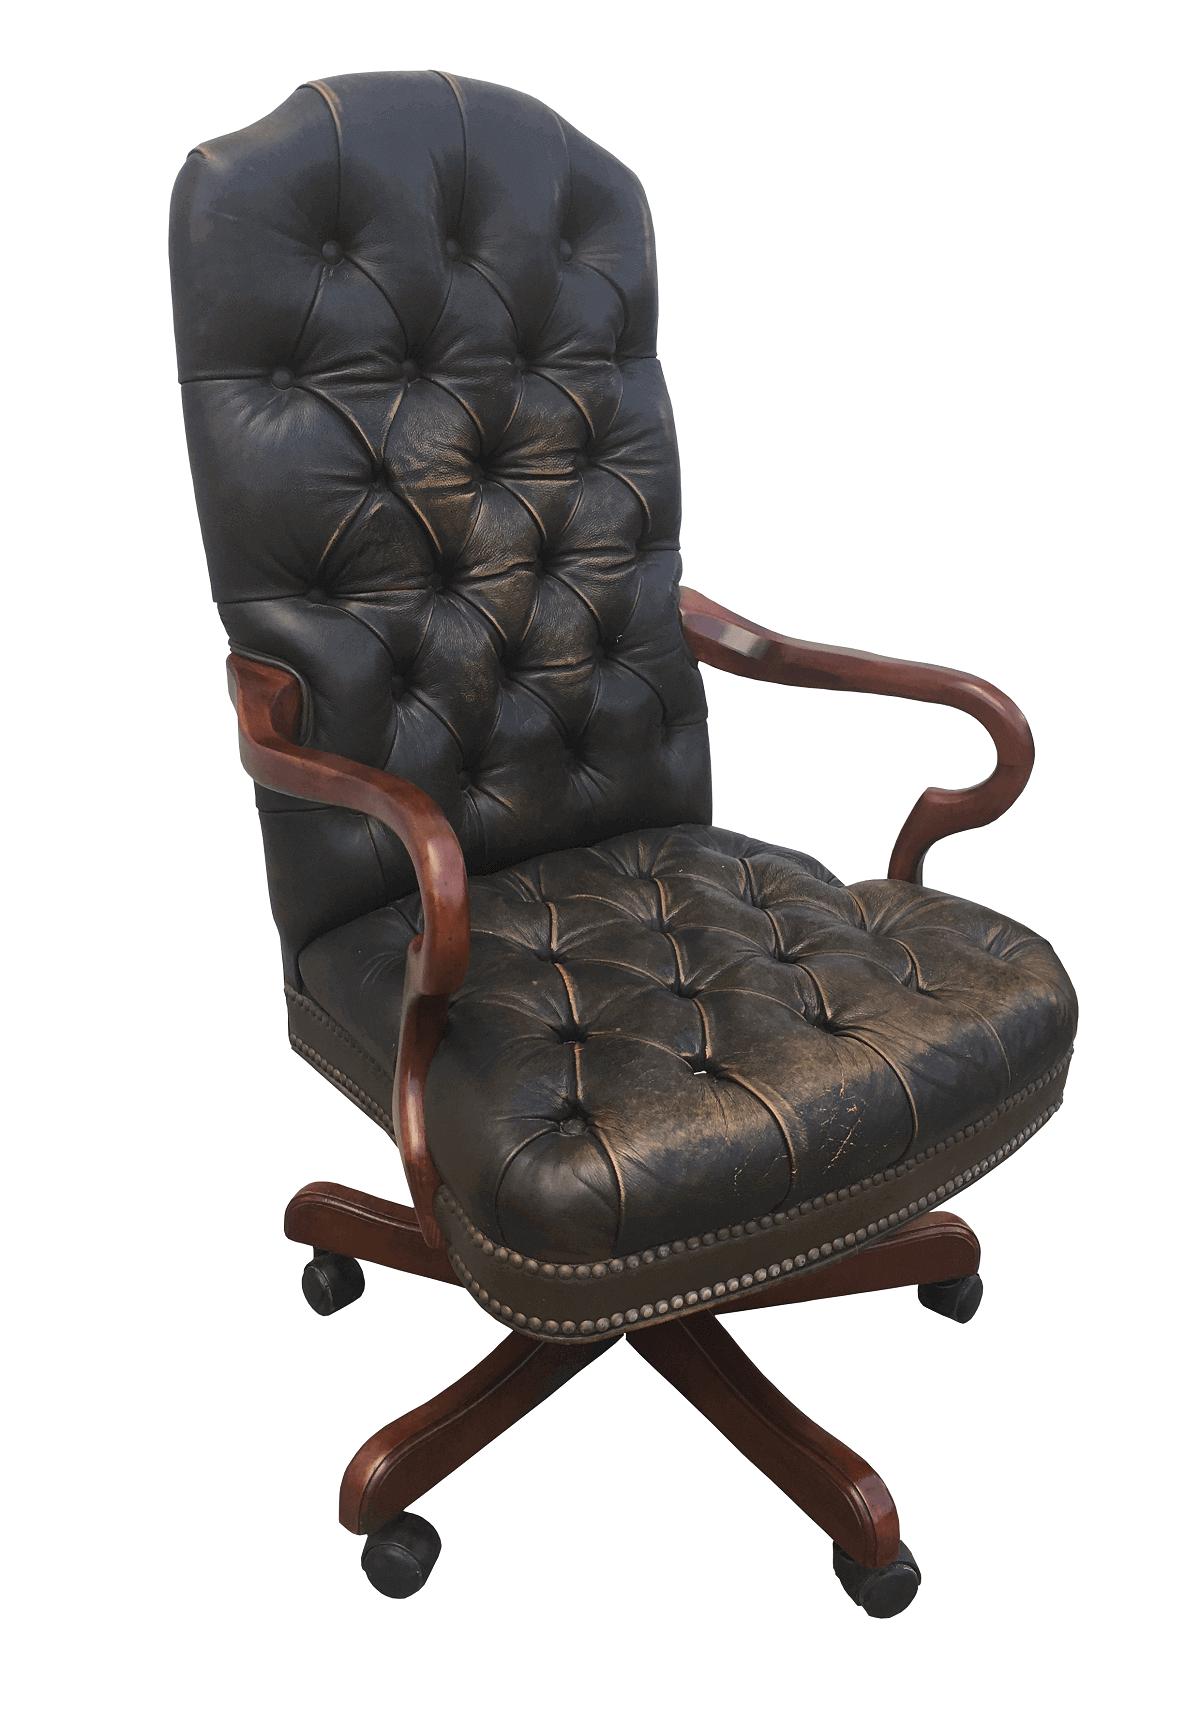 Antiga Cadeira Giratoria Couro Natural Capitone